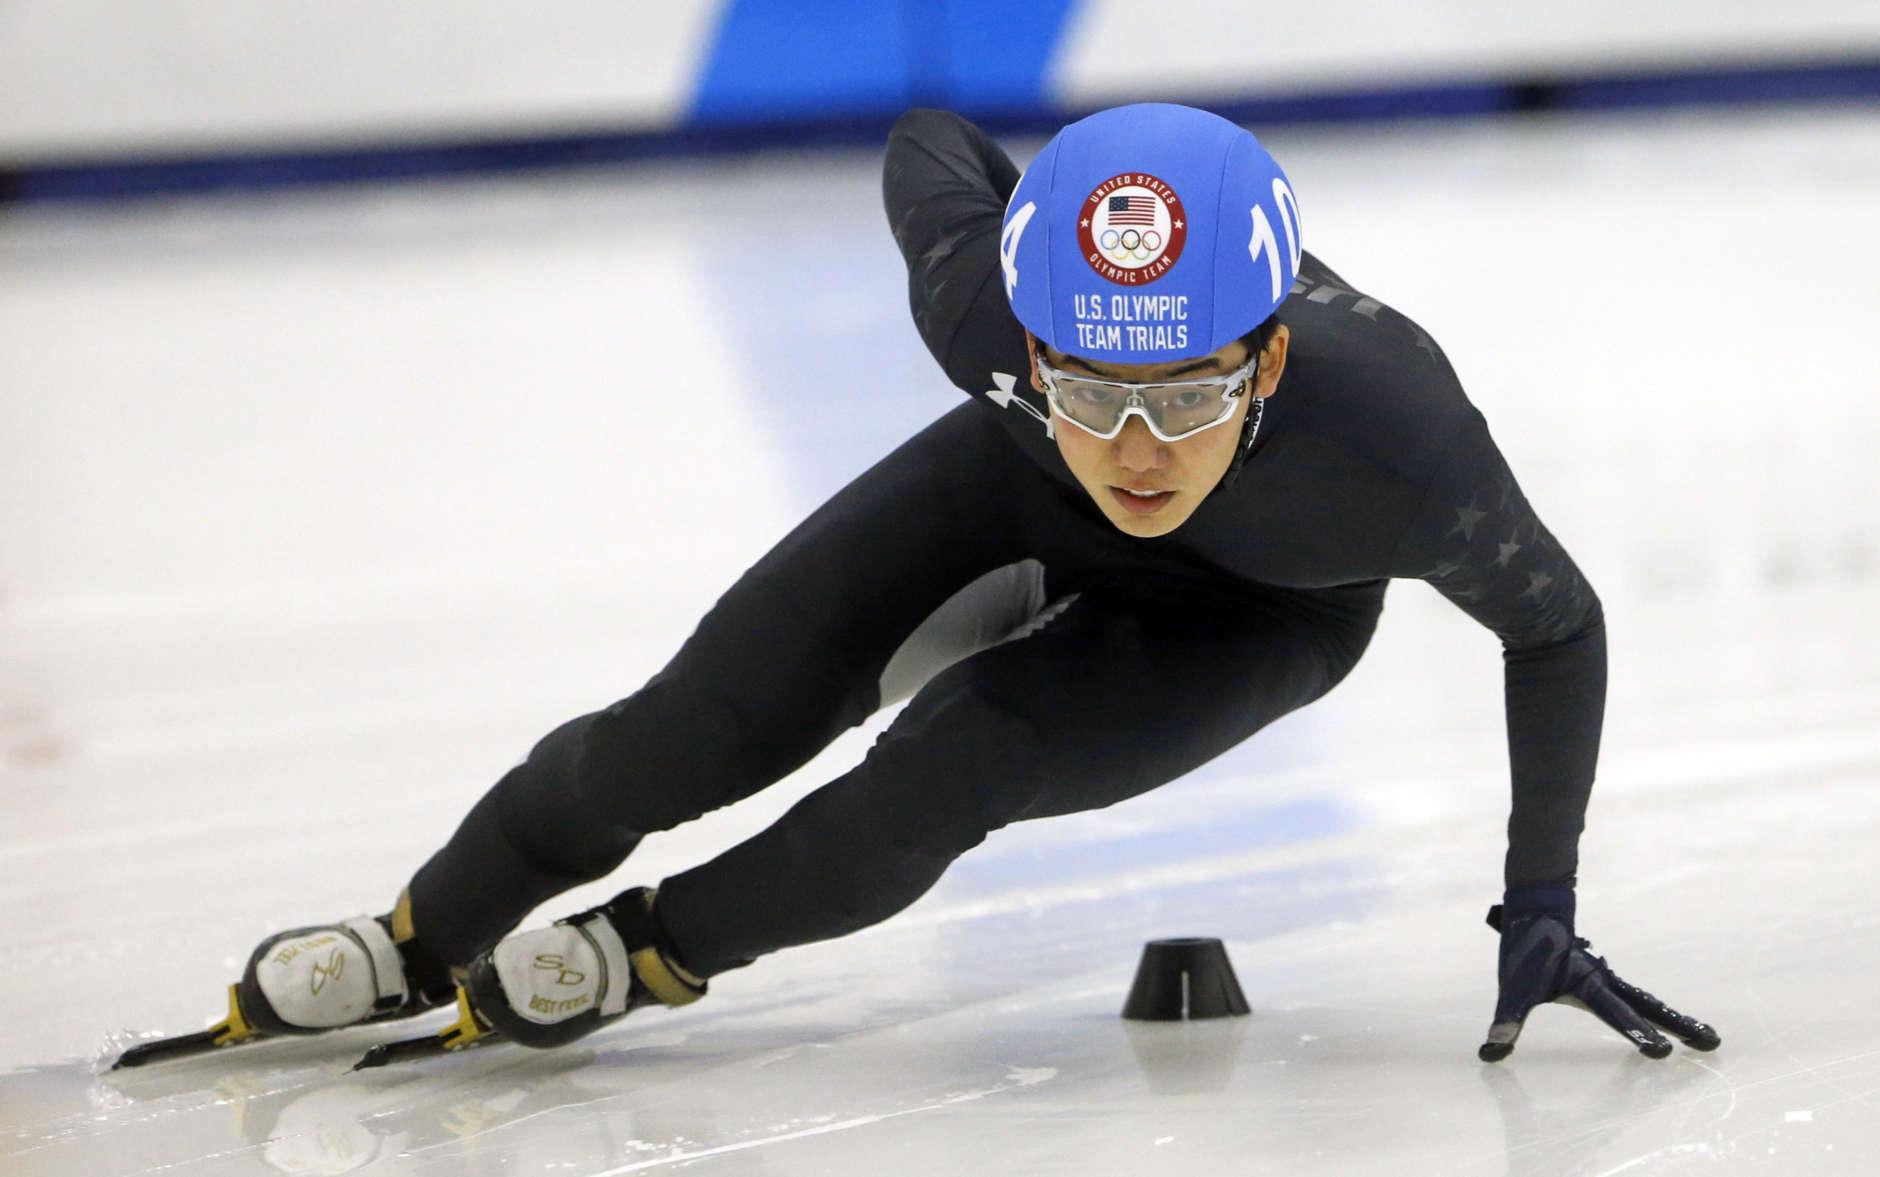 Thomas Insuk Hong (104) competes in the men's 500-meter during the U.S. Olympic short track speedskating trials Saturday, Dec. 16, 2017, in Kearns, Utah. (AP Photo/Rick Bowmer)